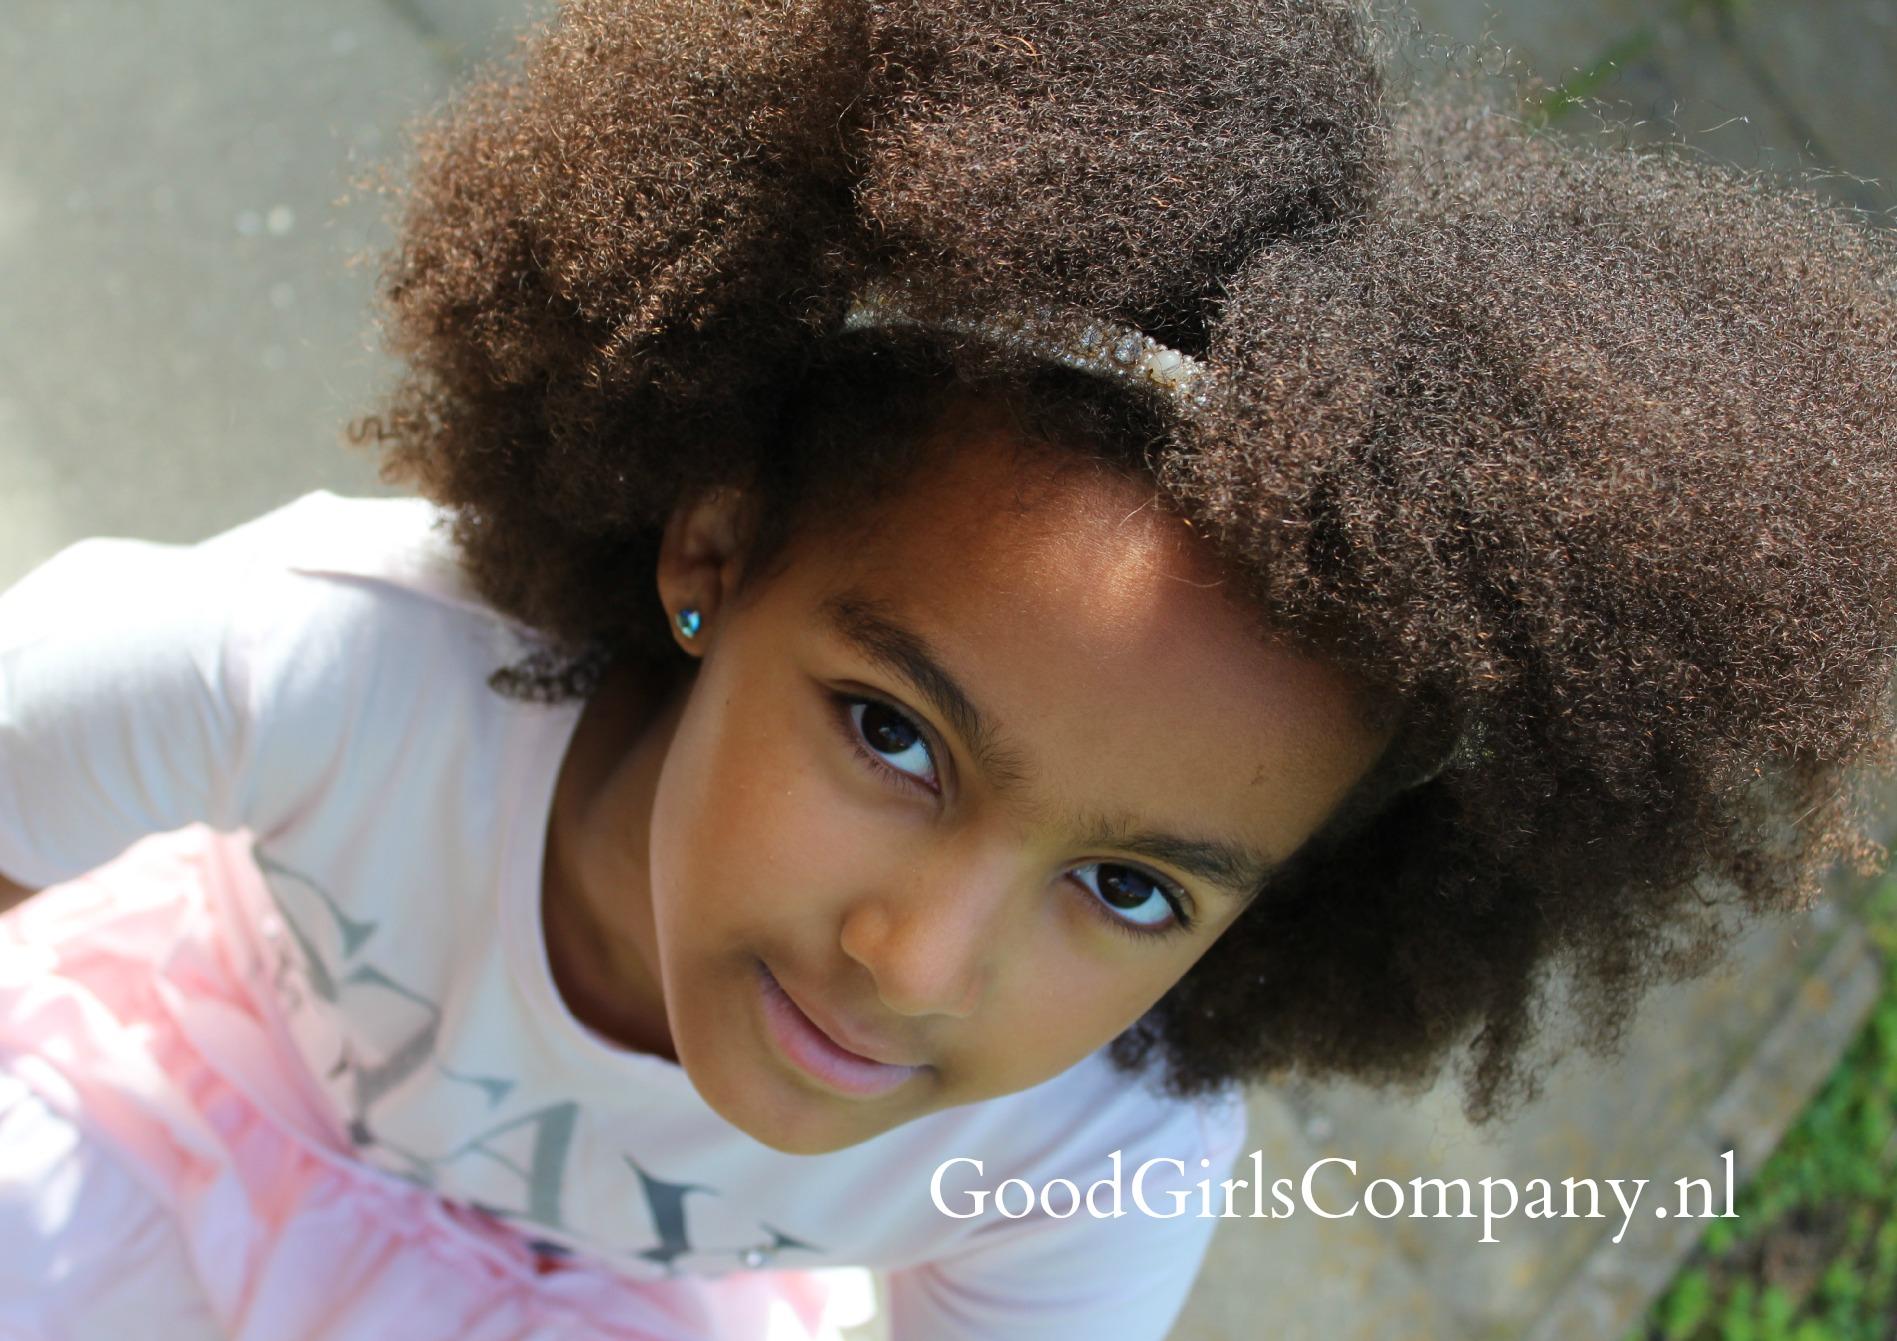 Genoeg Hoera Miss G is jarig! | GoodGirlsCompany &VF39